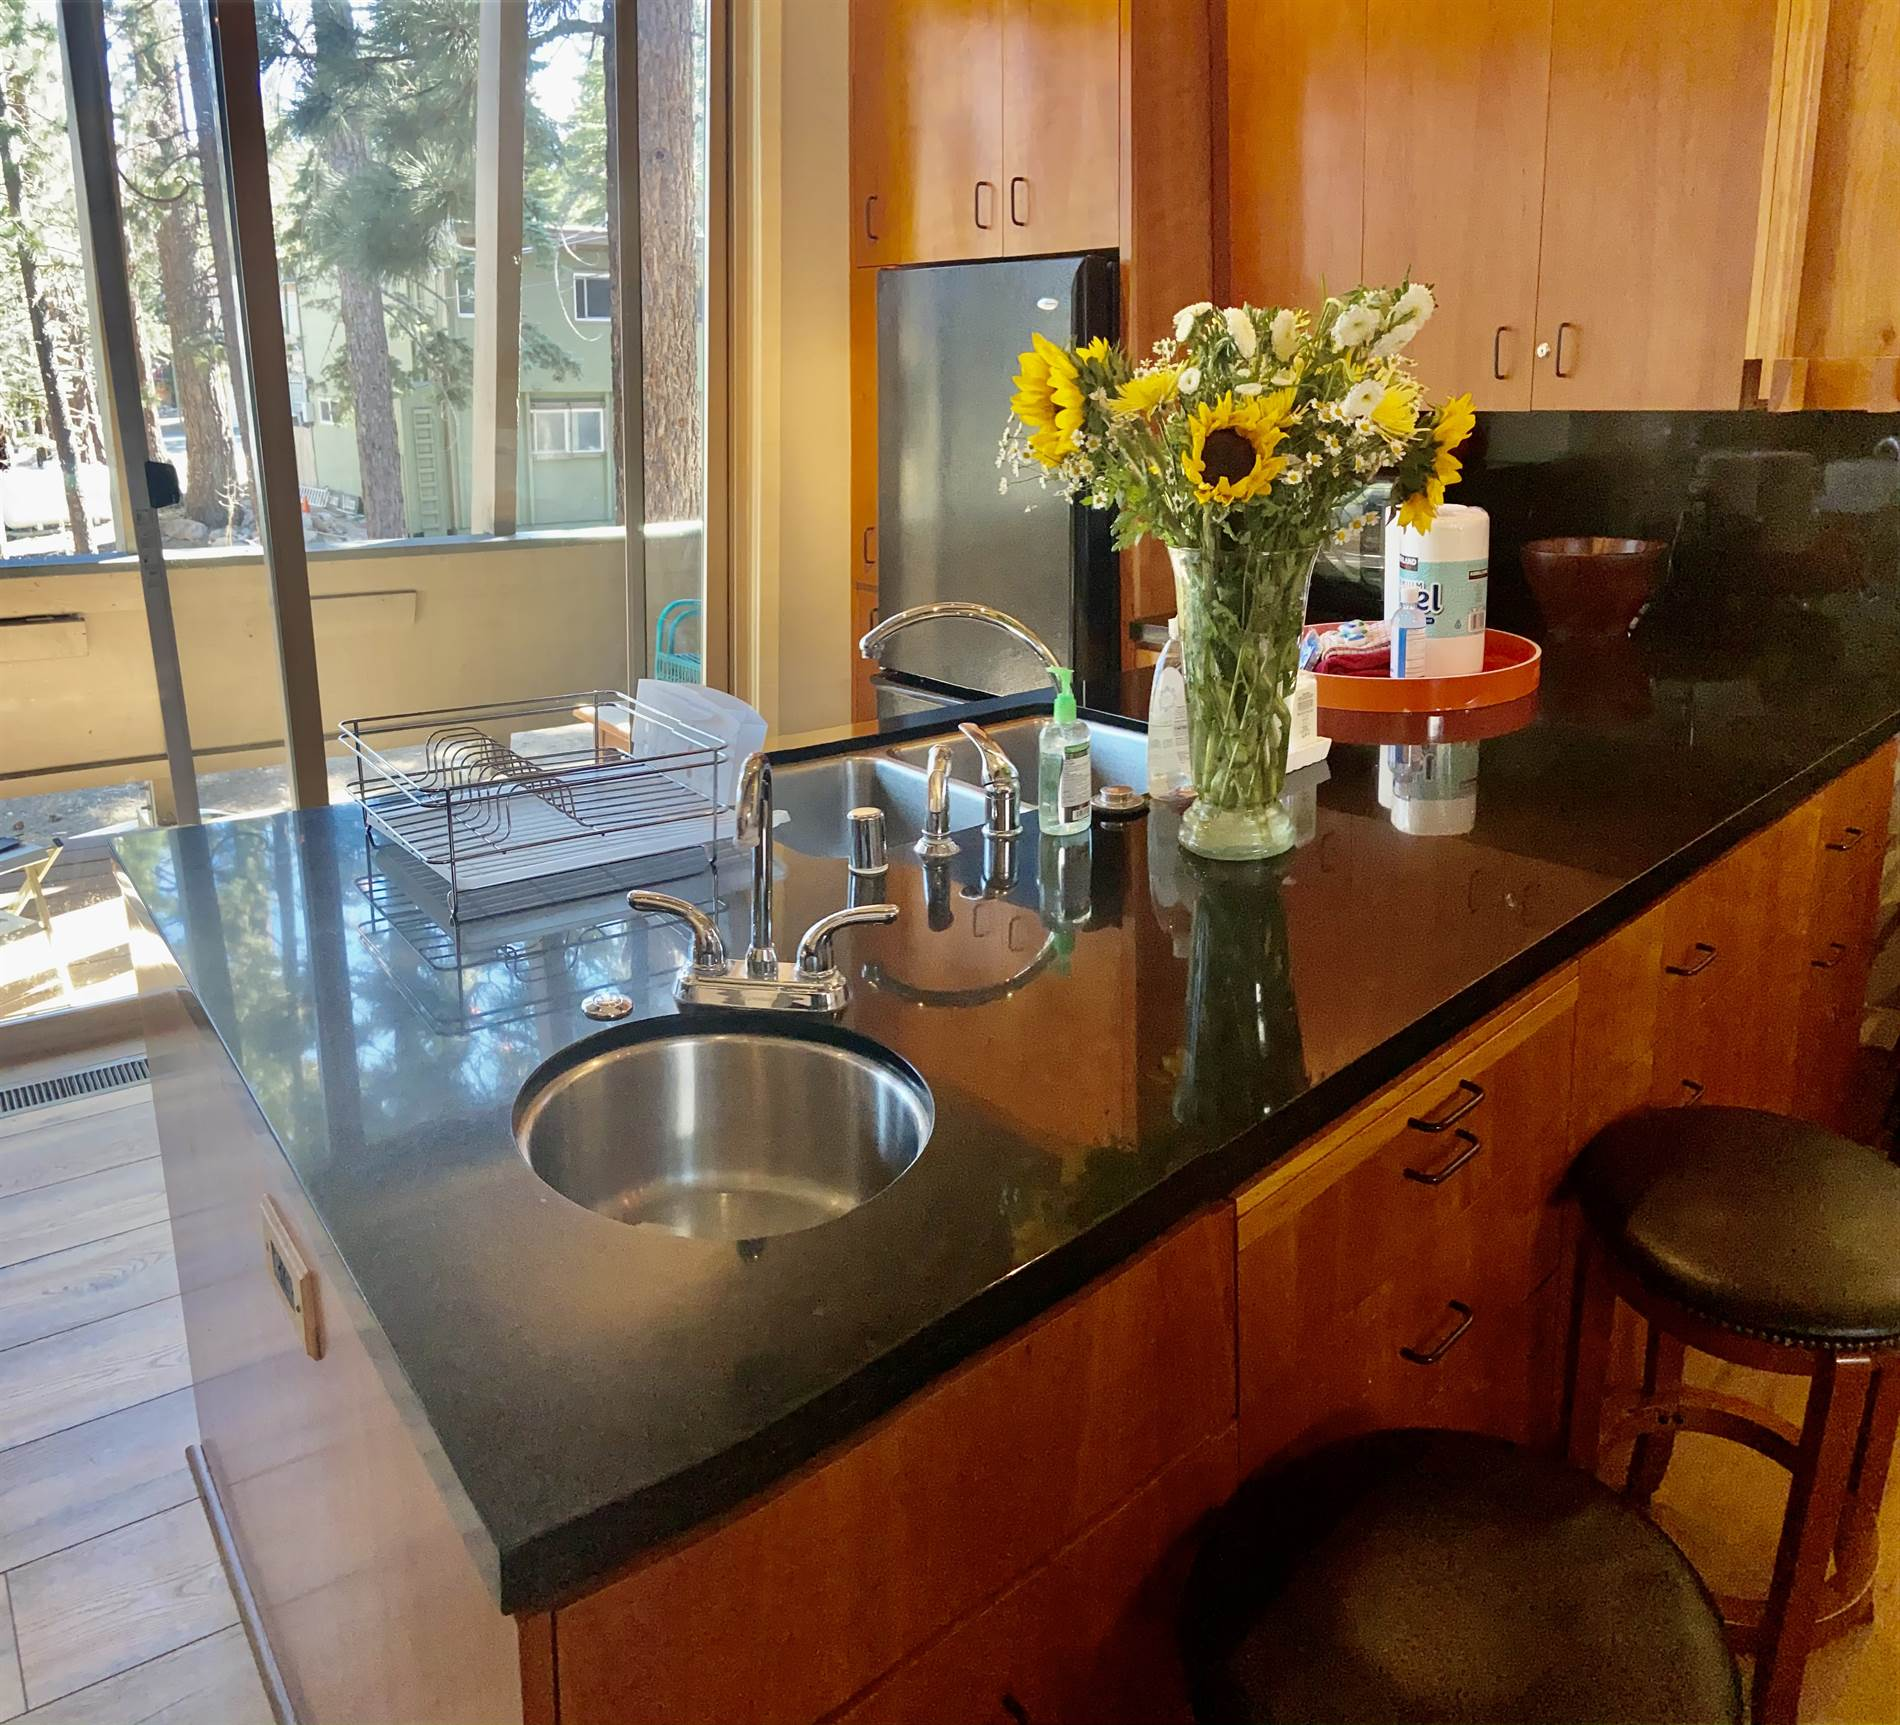 4 Kelley Rd. #5, Tyrolean Village l #5, Mammoth Lakes, CA 93546